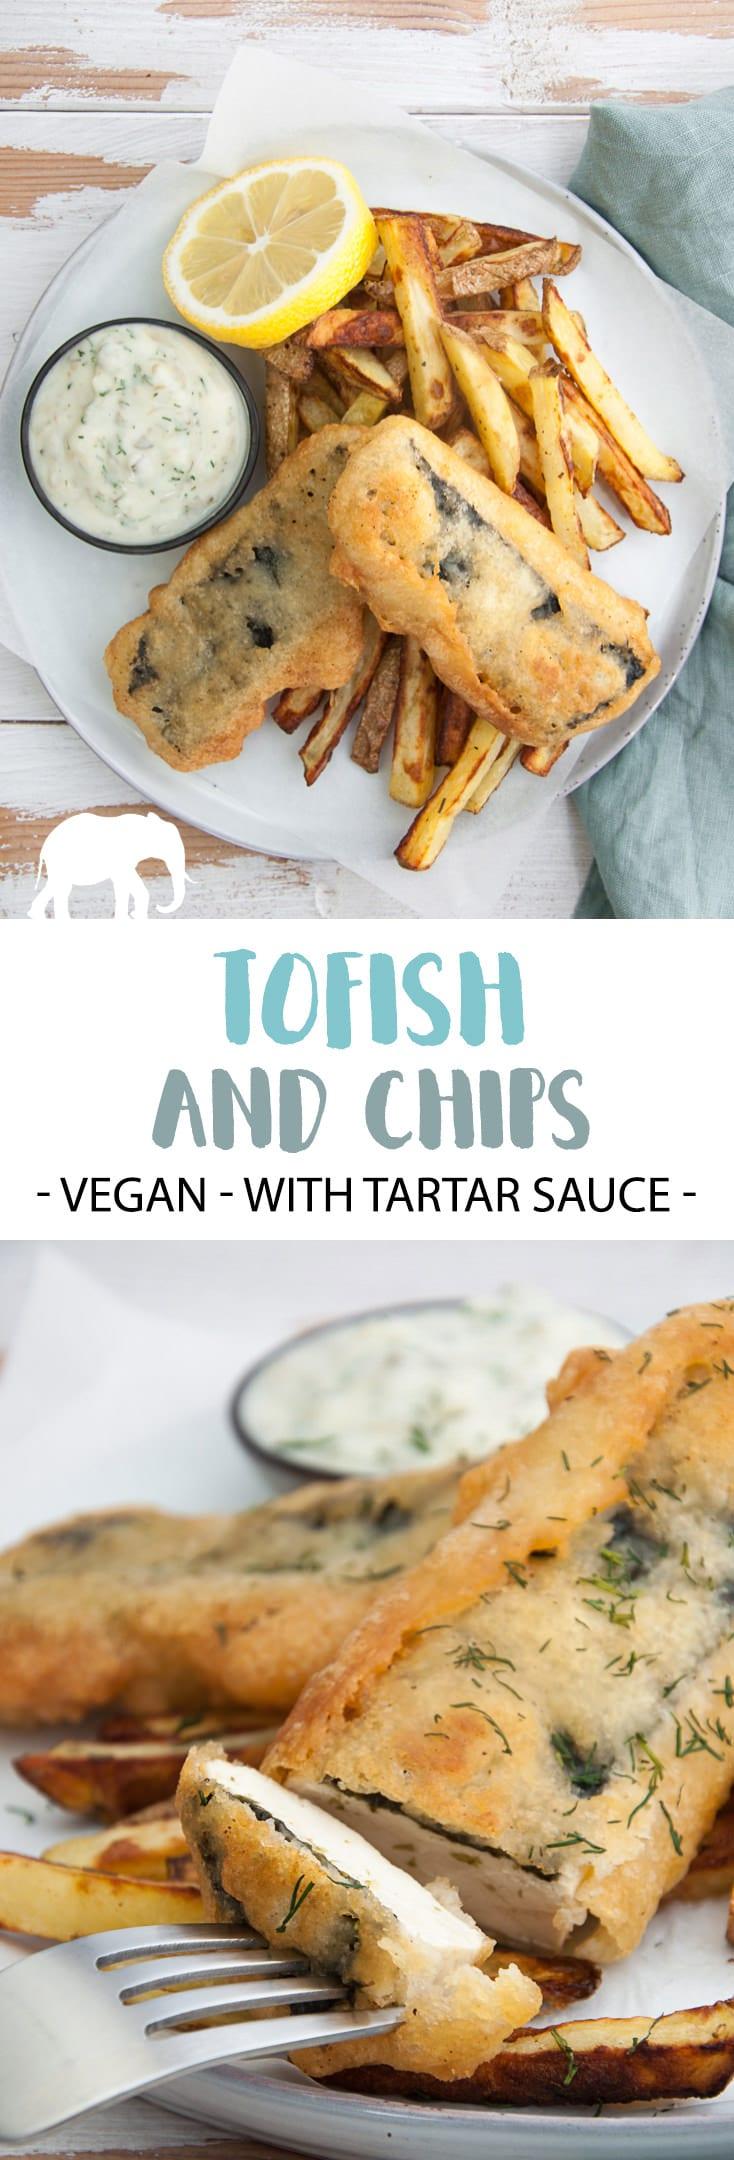 Vegan Tofish and Chips served with homemade Tartar Sauce #vegan #fish #tofish #tofu #plantbased